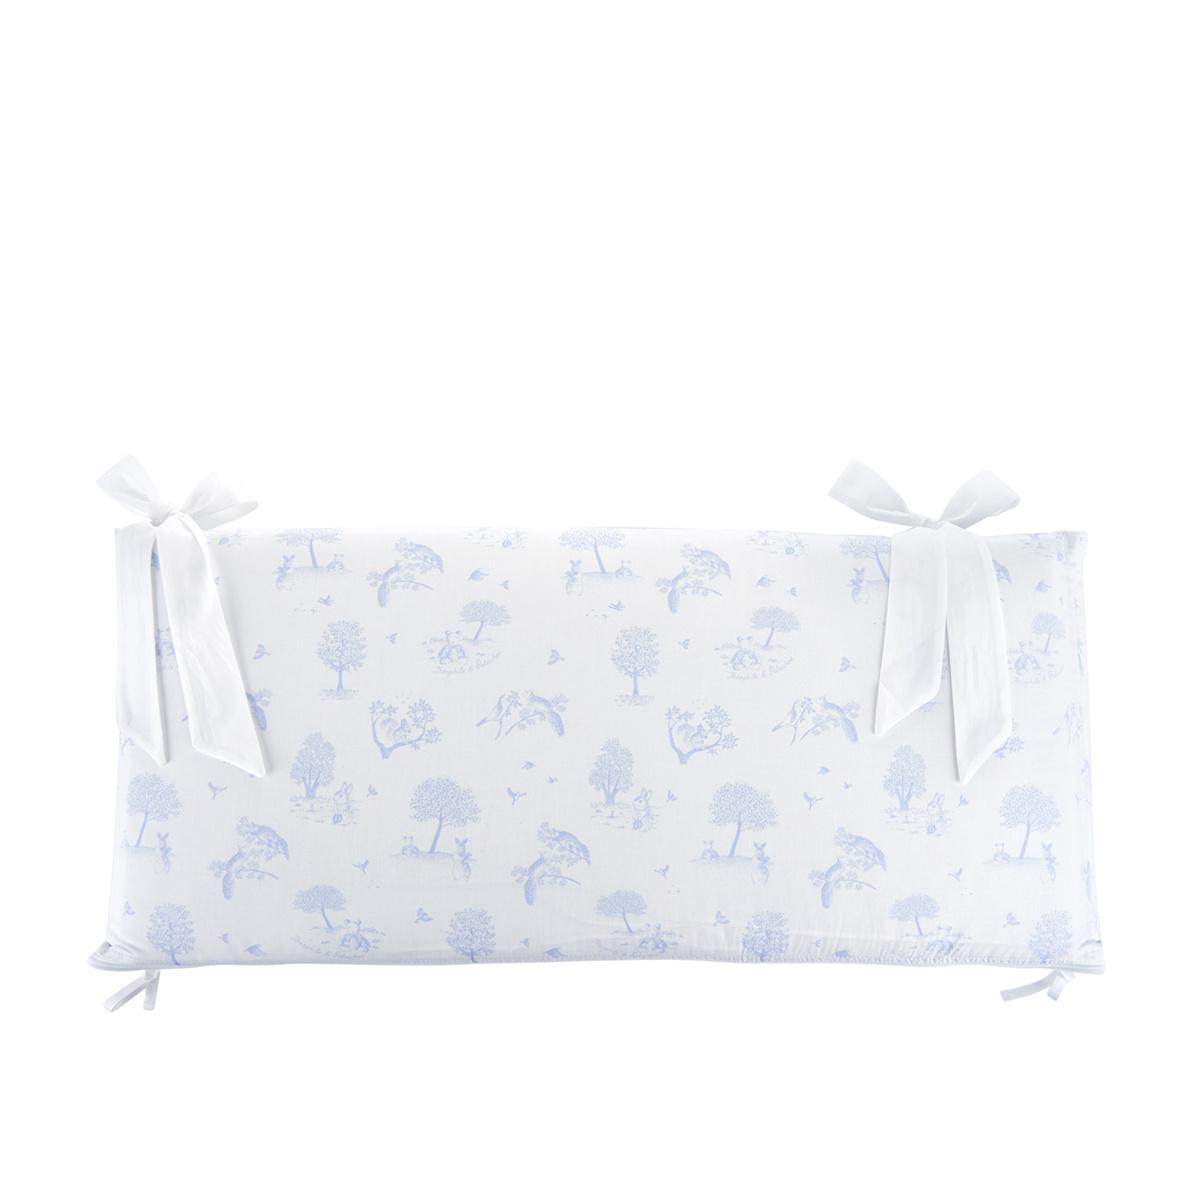 Bedomranding  60cm  Sweet Blue Theophile & Patachou-1